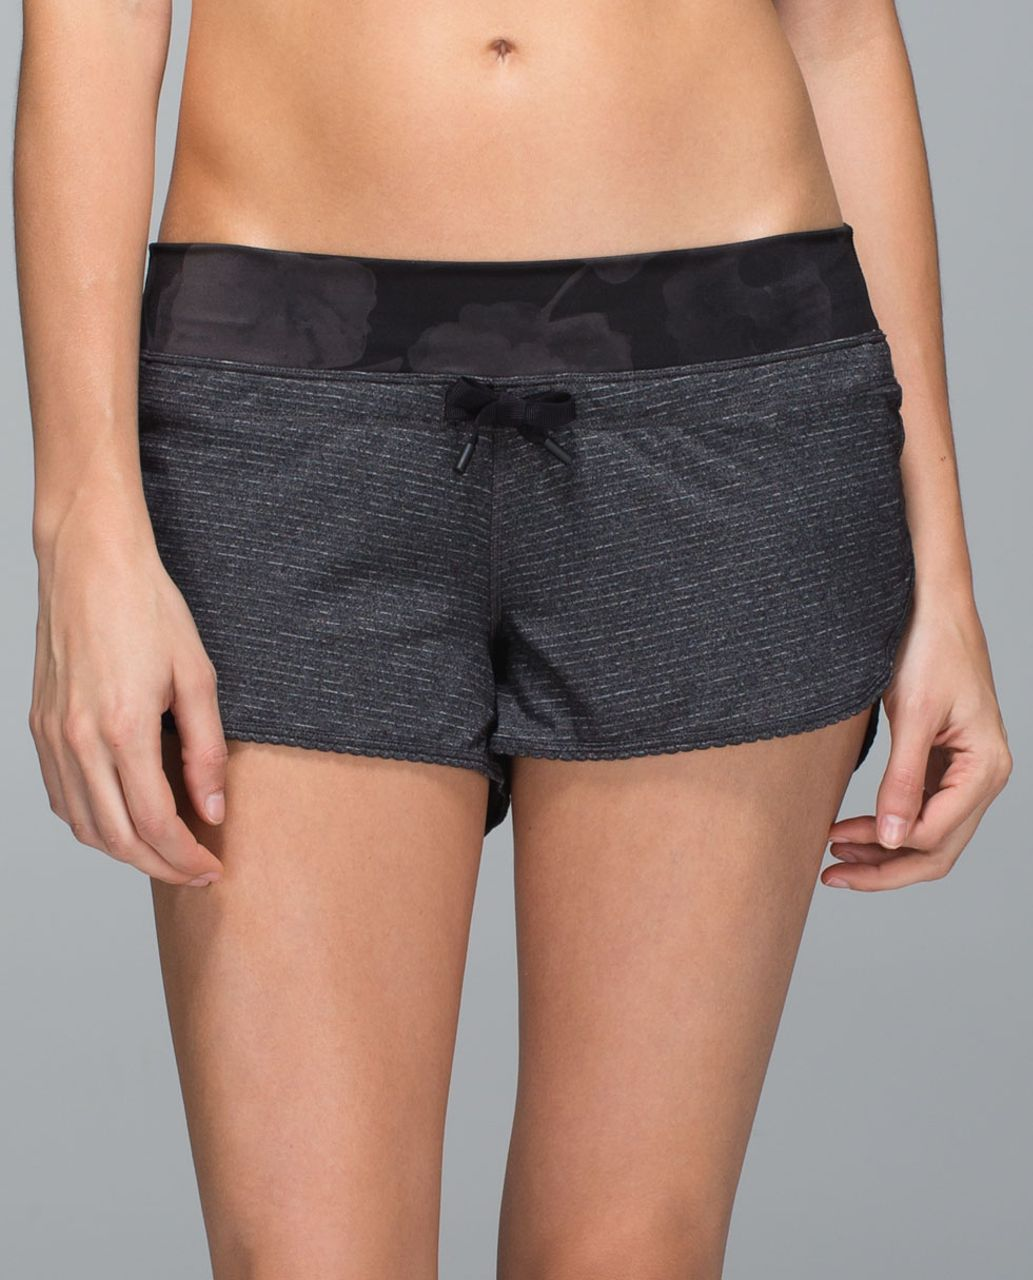 Lululemon Bhakti Yoga Short - Heathered Black / Inky Floral Soot Black